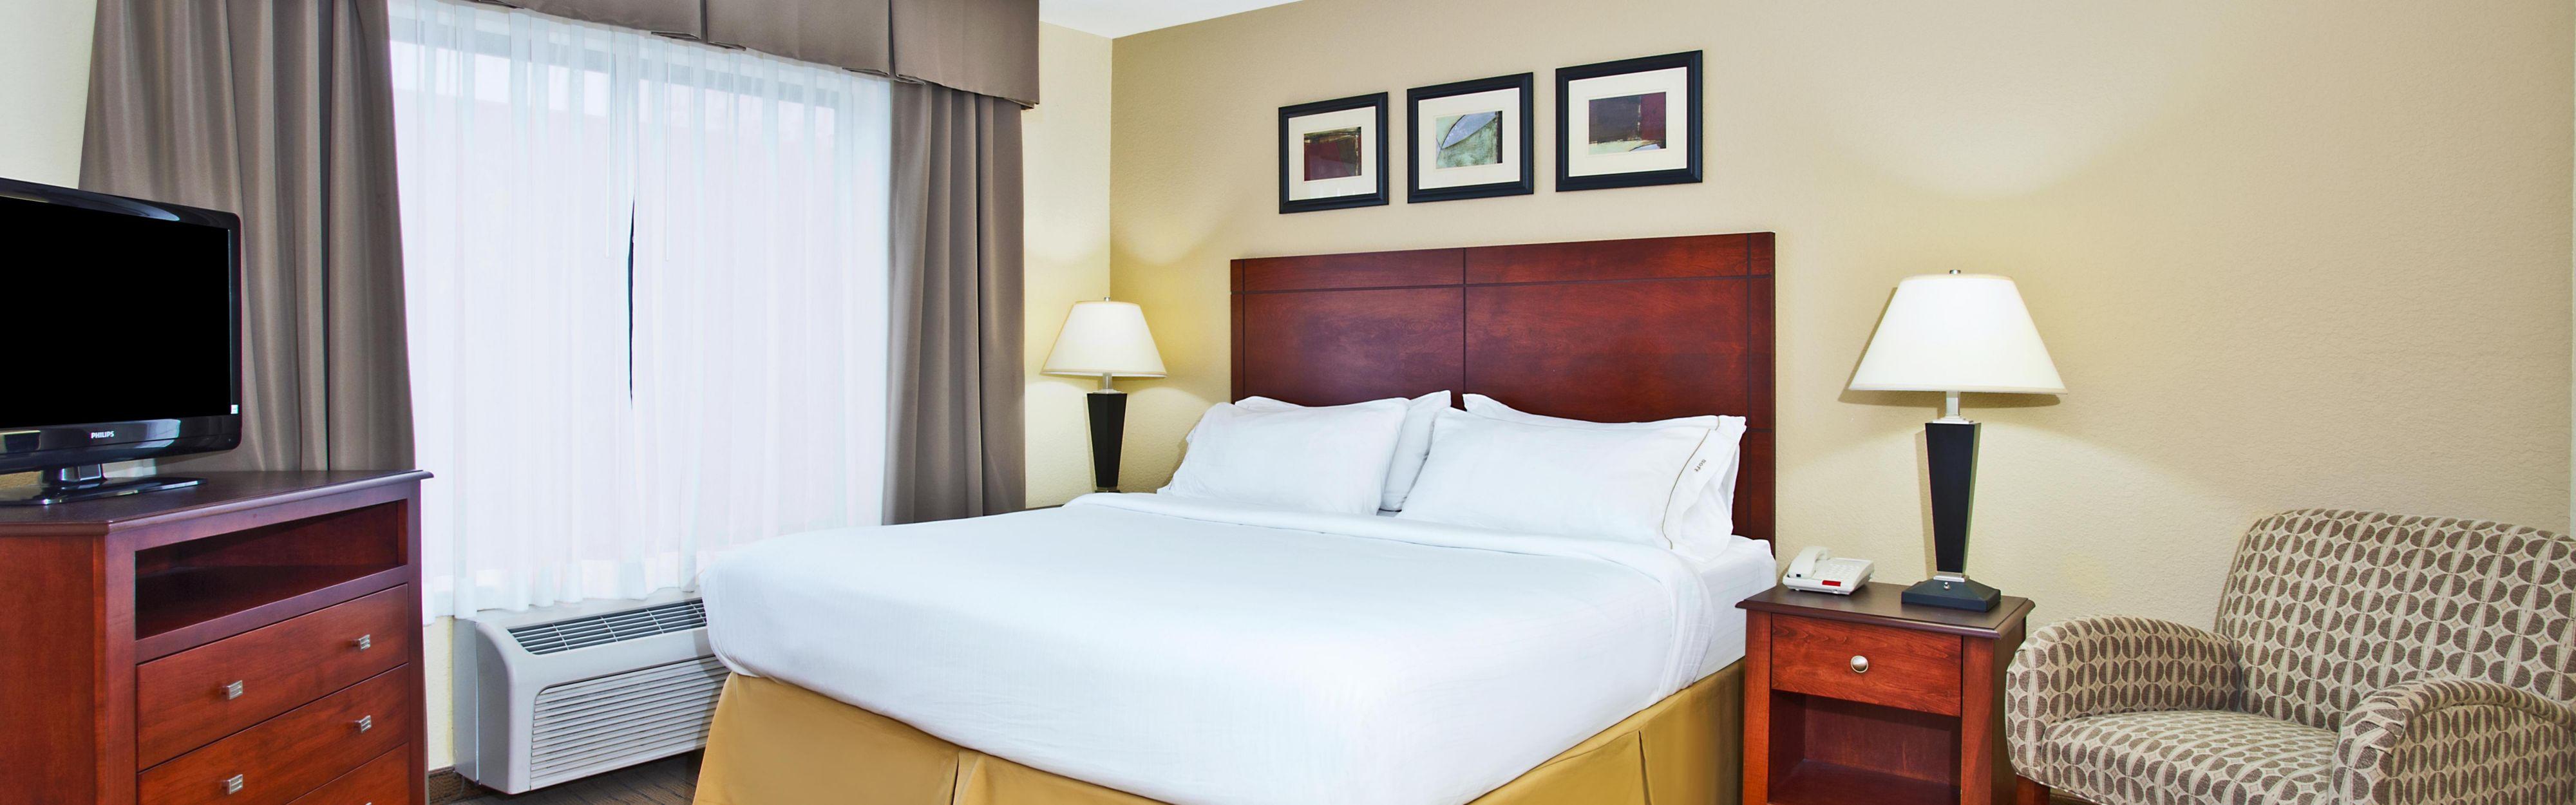 Holiday Inn Express & Suites East Lansing image 1